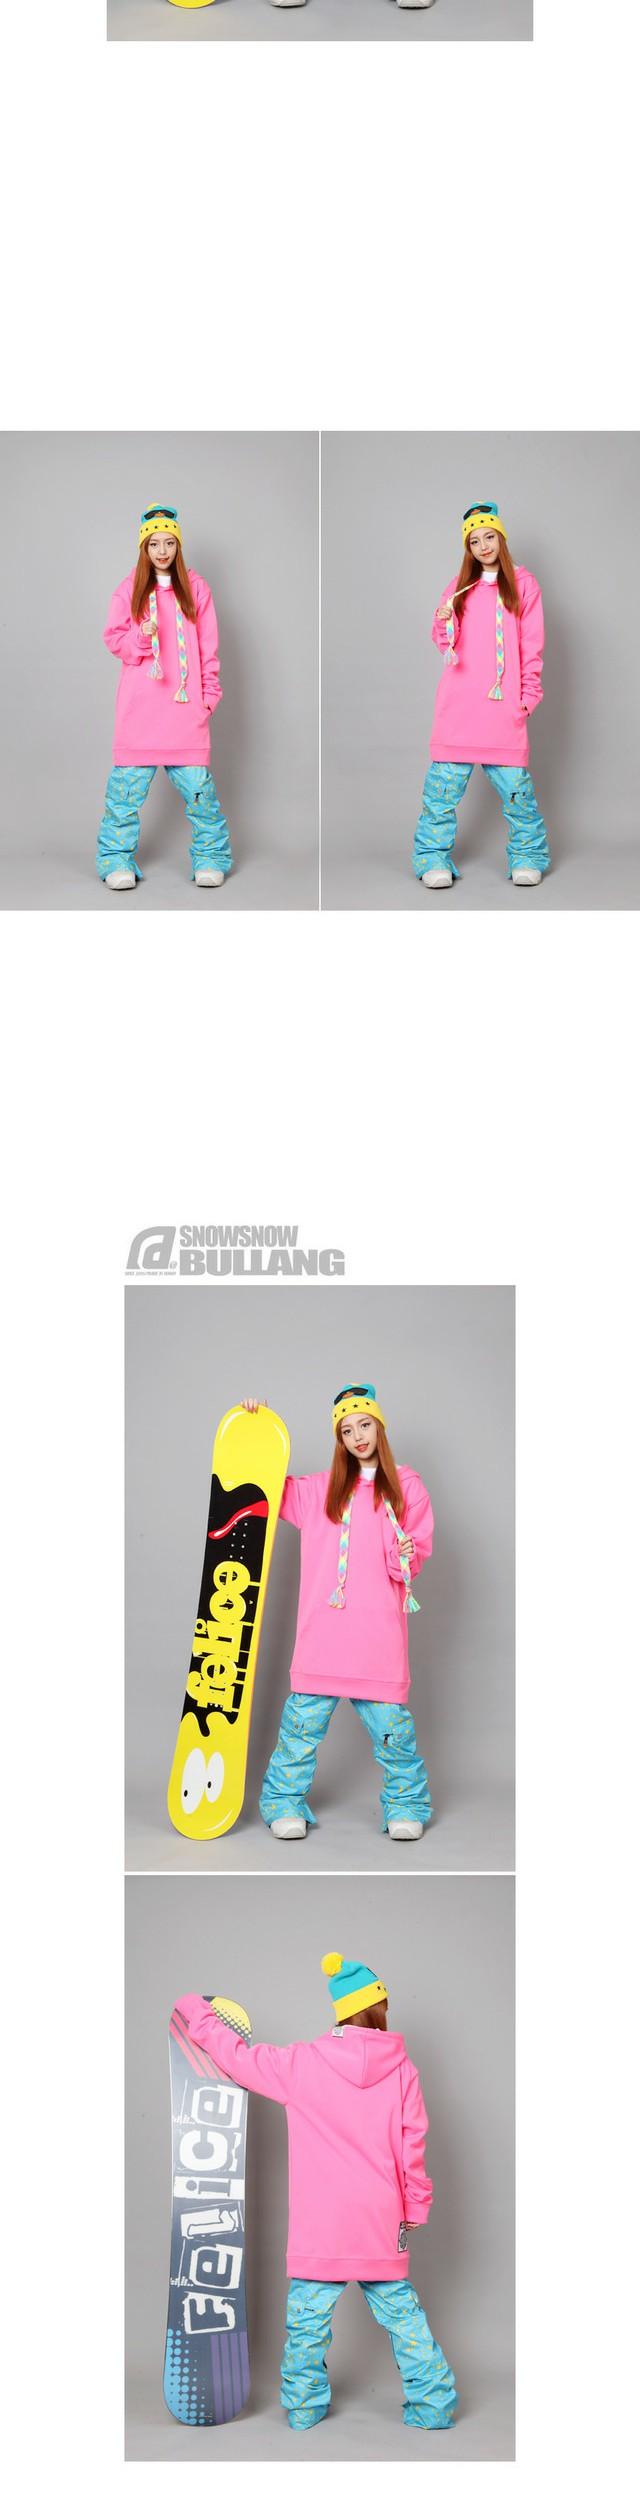 Fluorescent board hood